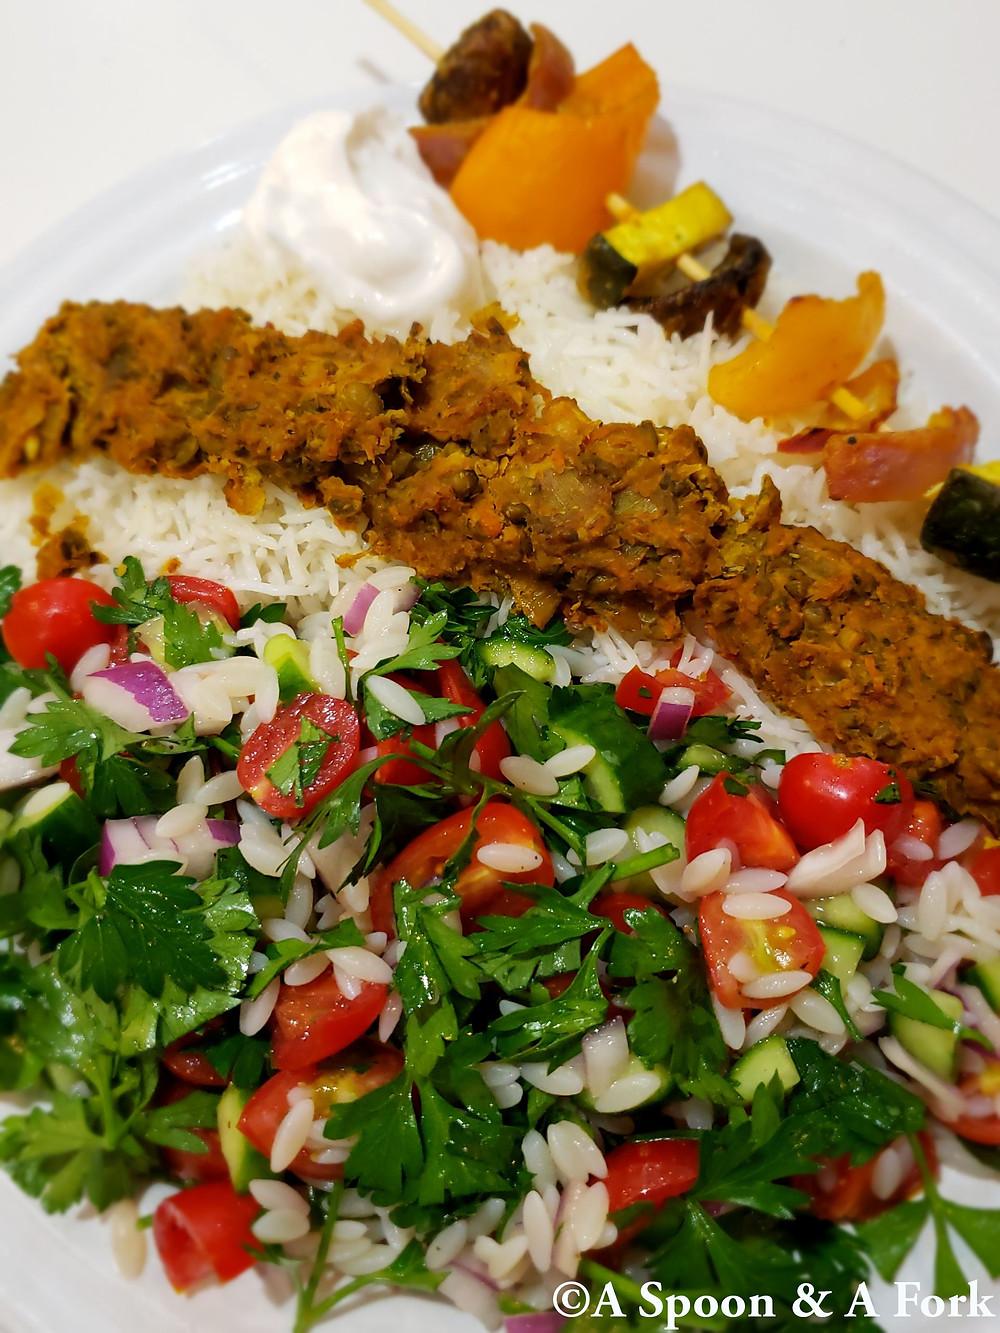 Afghan Veggie Shawarma with basmati, Veggie Kabob and Israeli Salad with Orzo